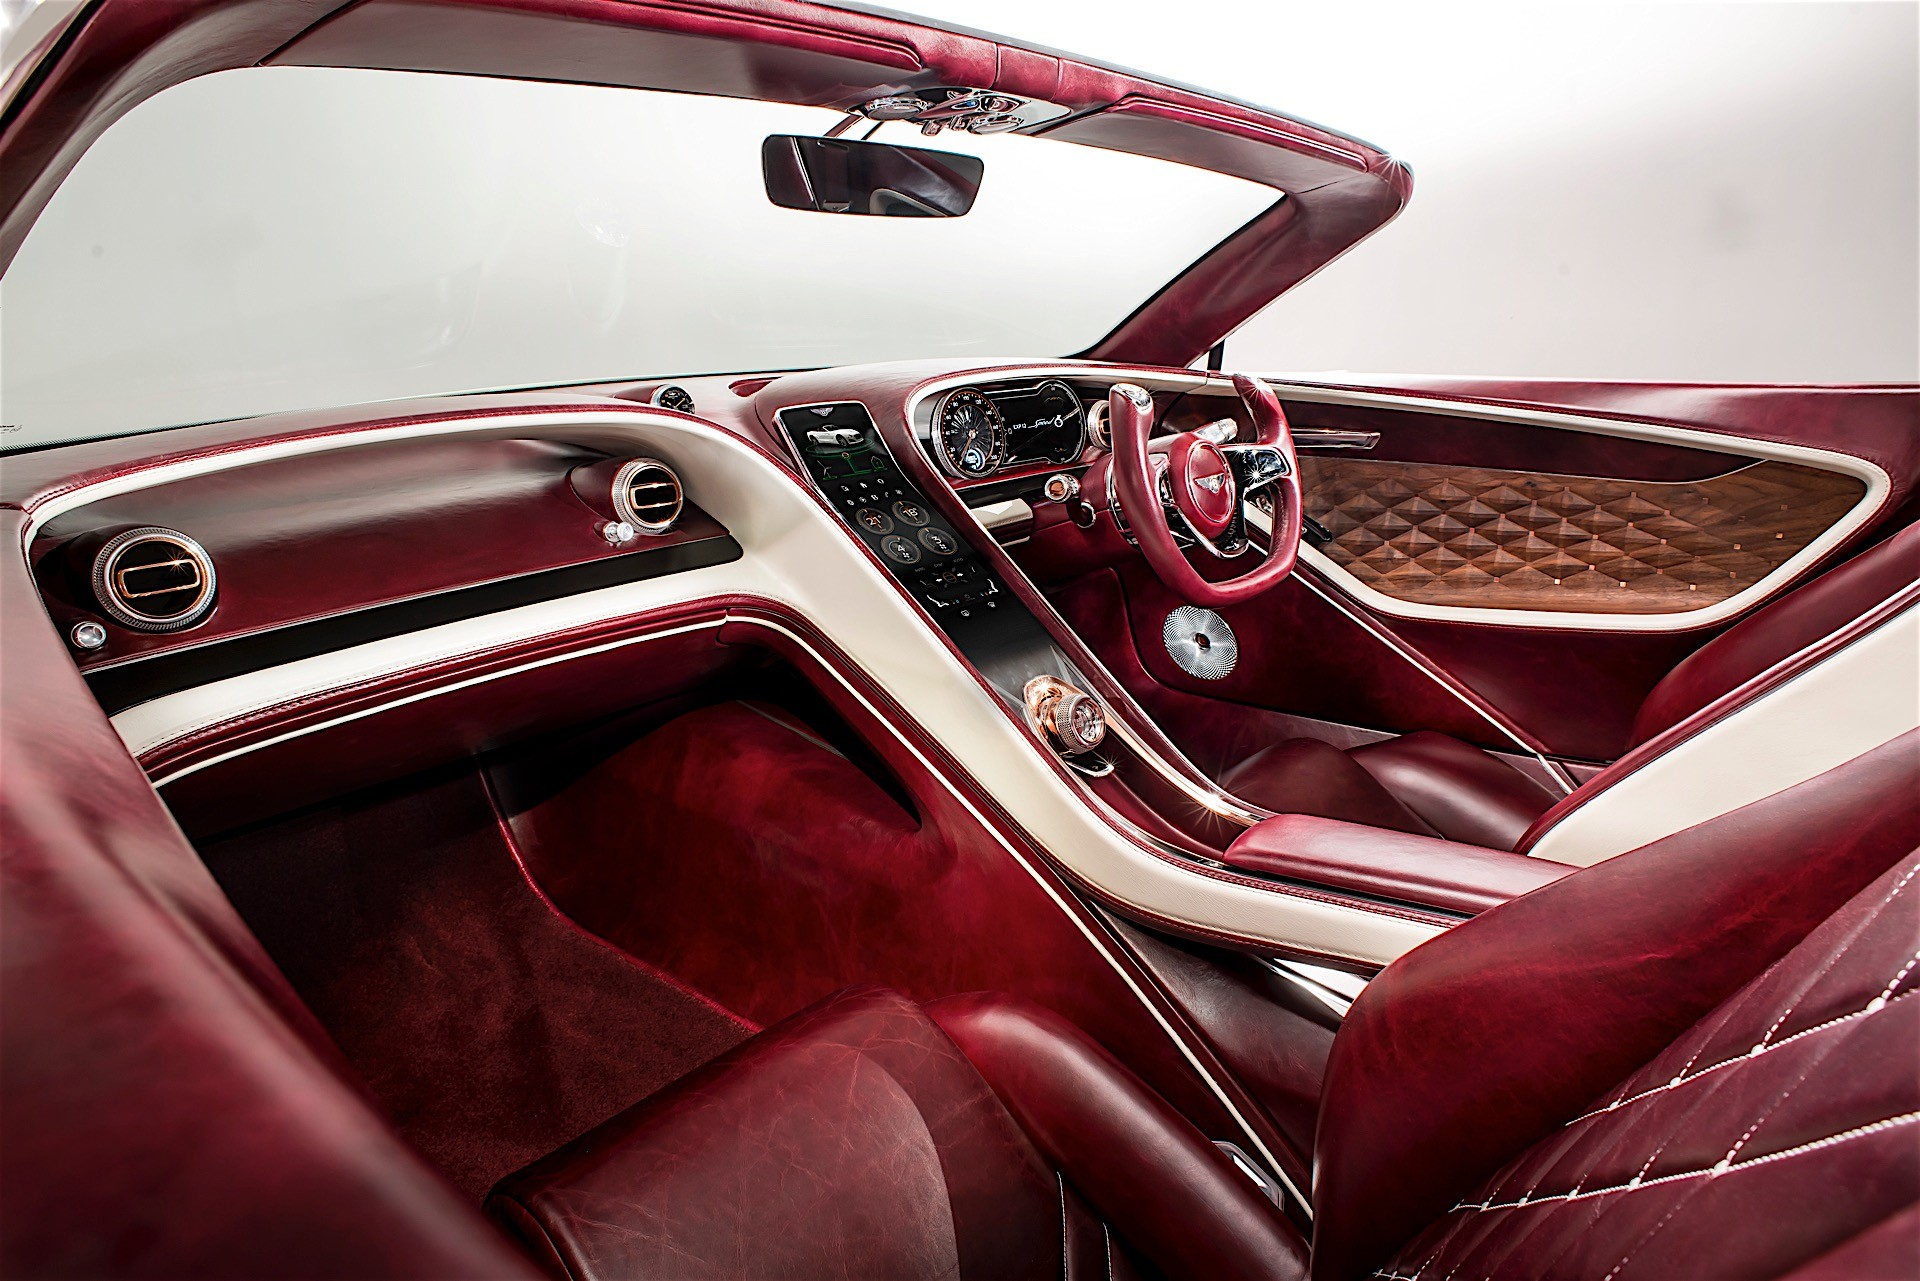 Bentley-gui-thong-diep-moi-voi-xe-dien-anh-5